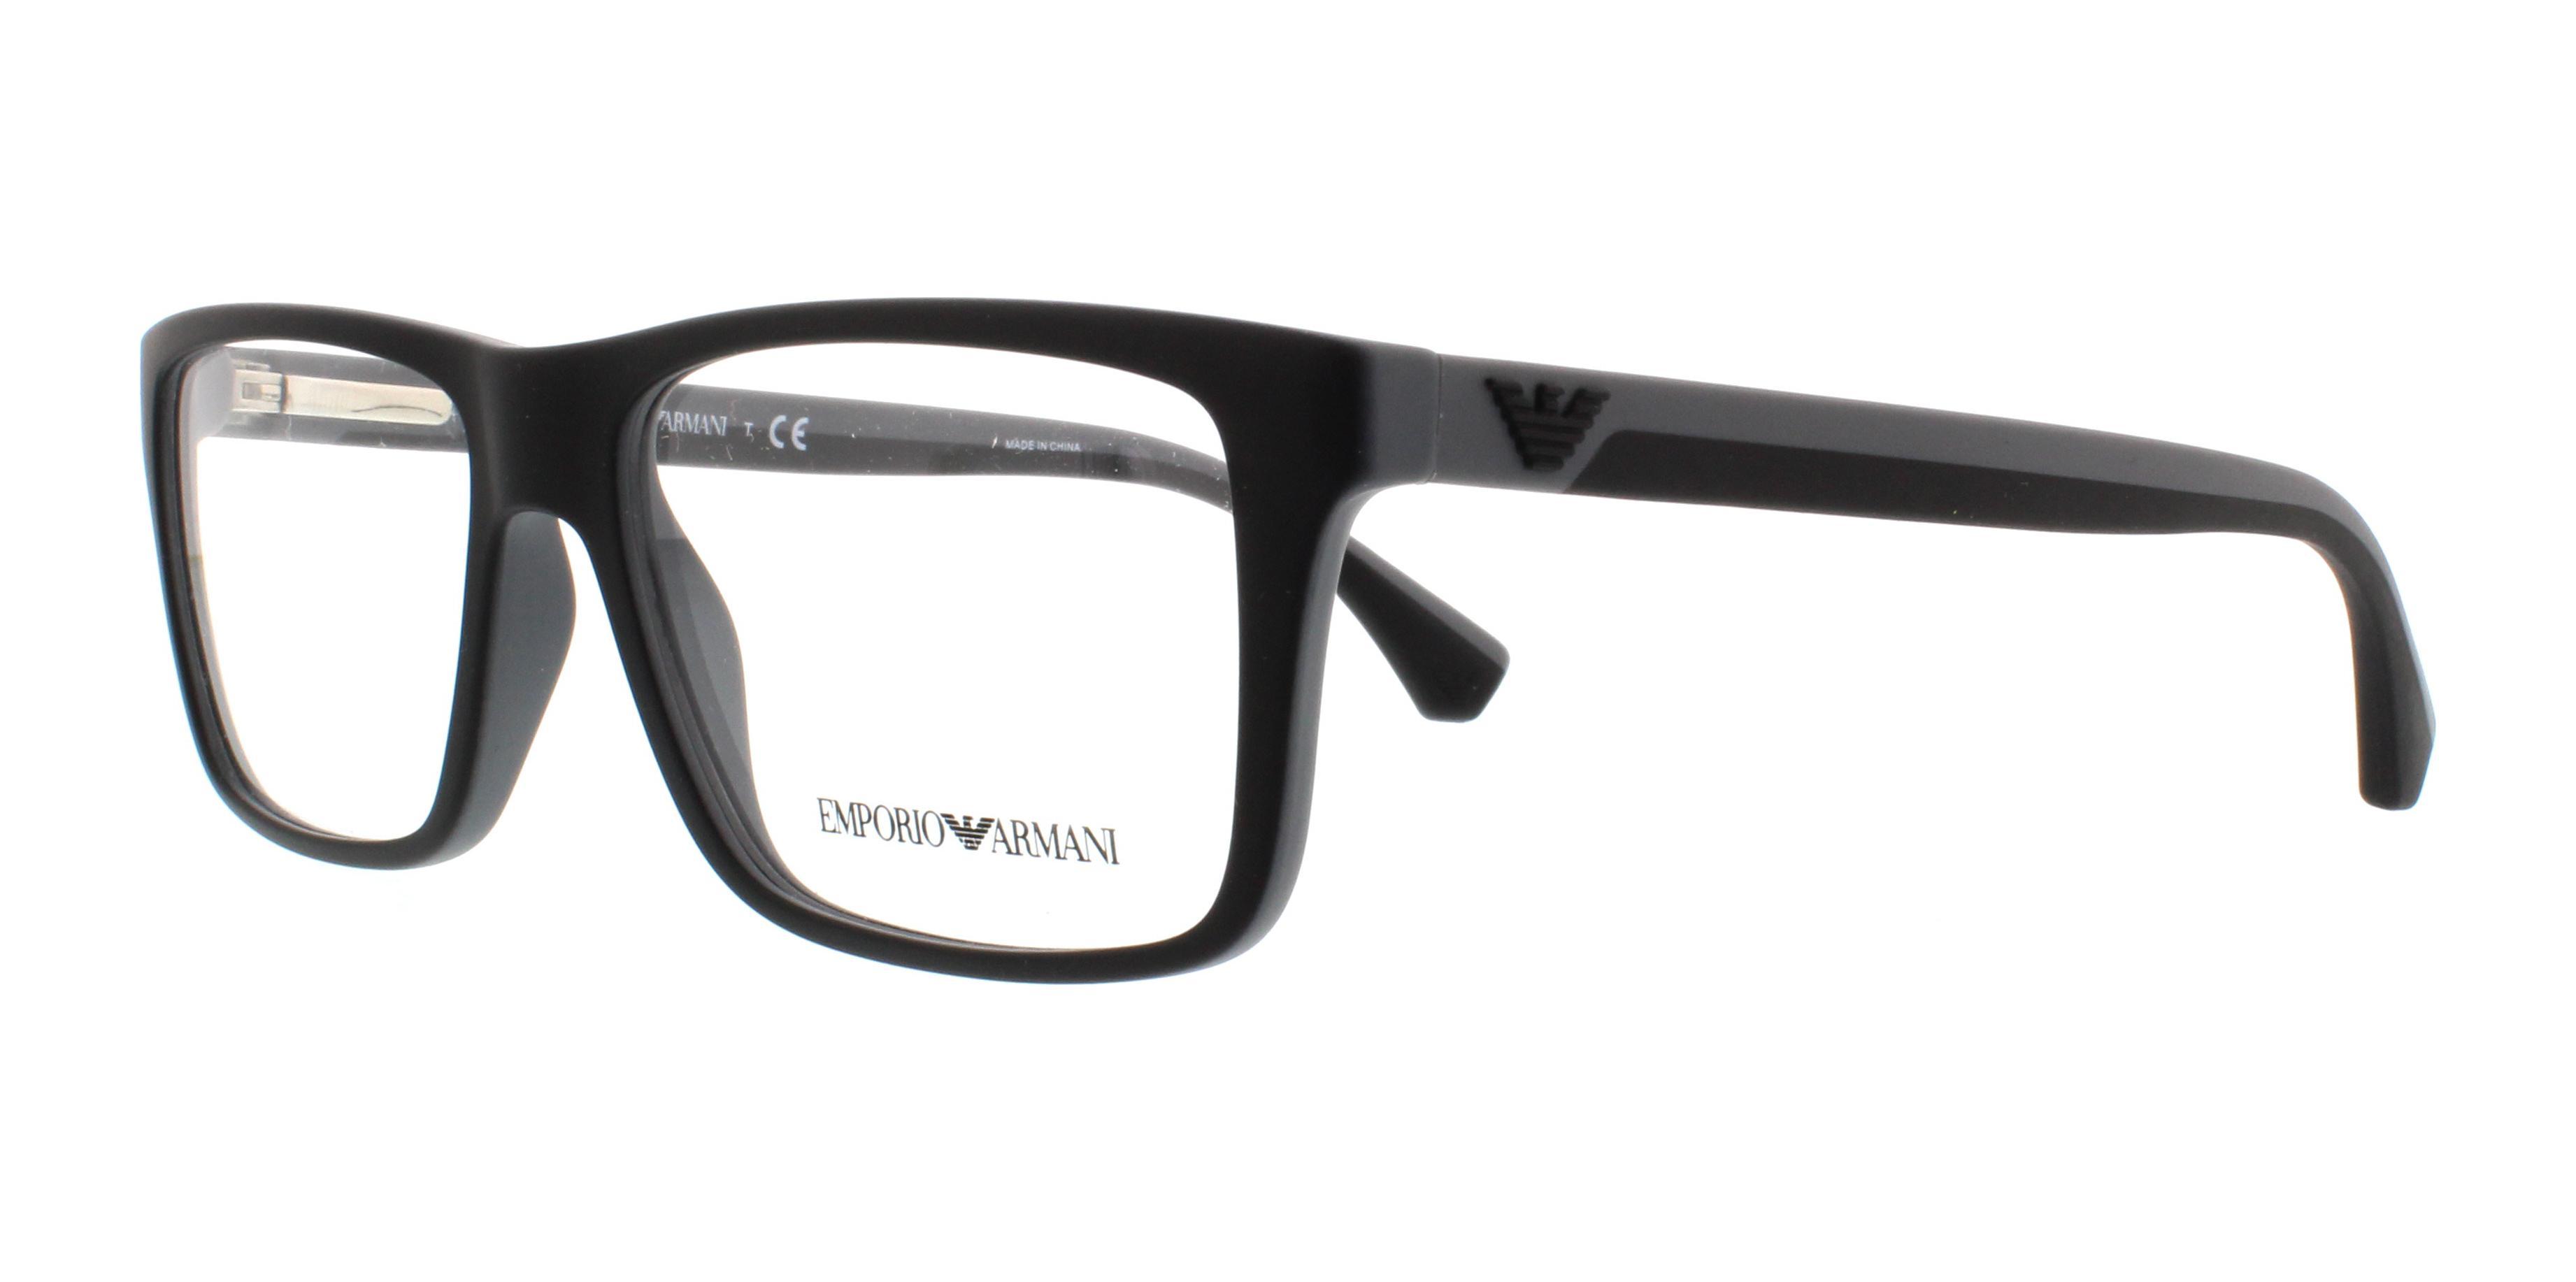 b29095c2c082 Designer Frames Outlet. Emporio Armani EA3034